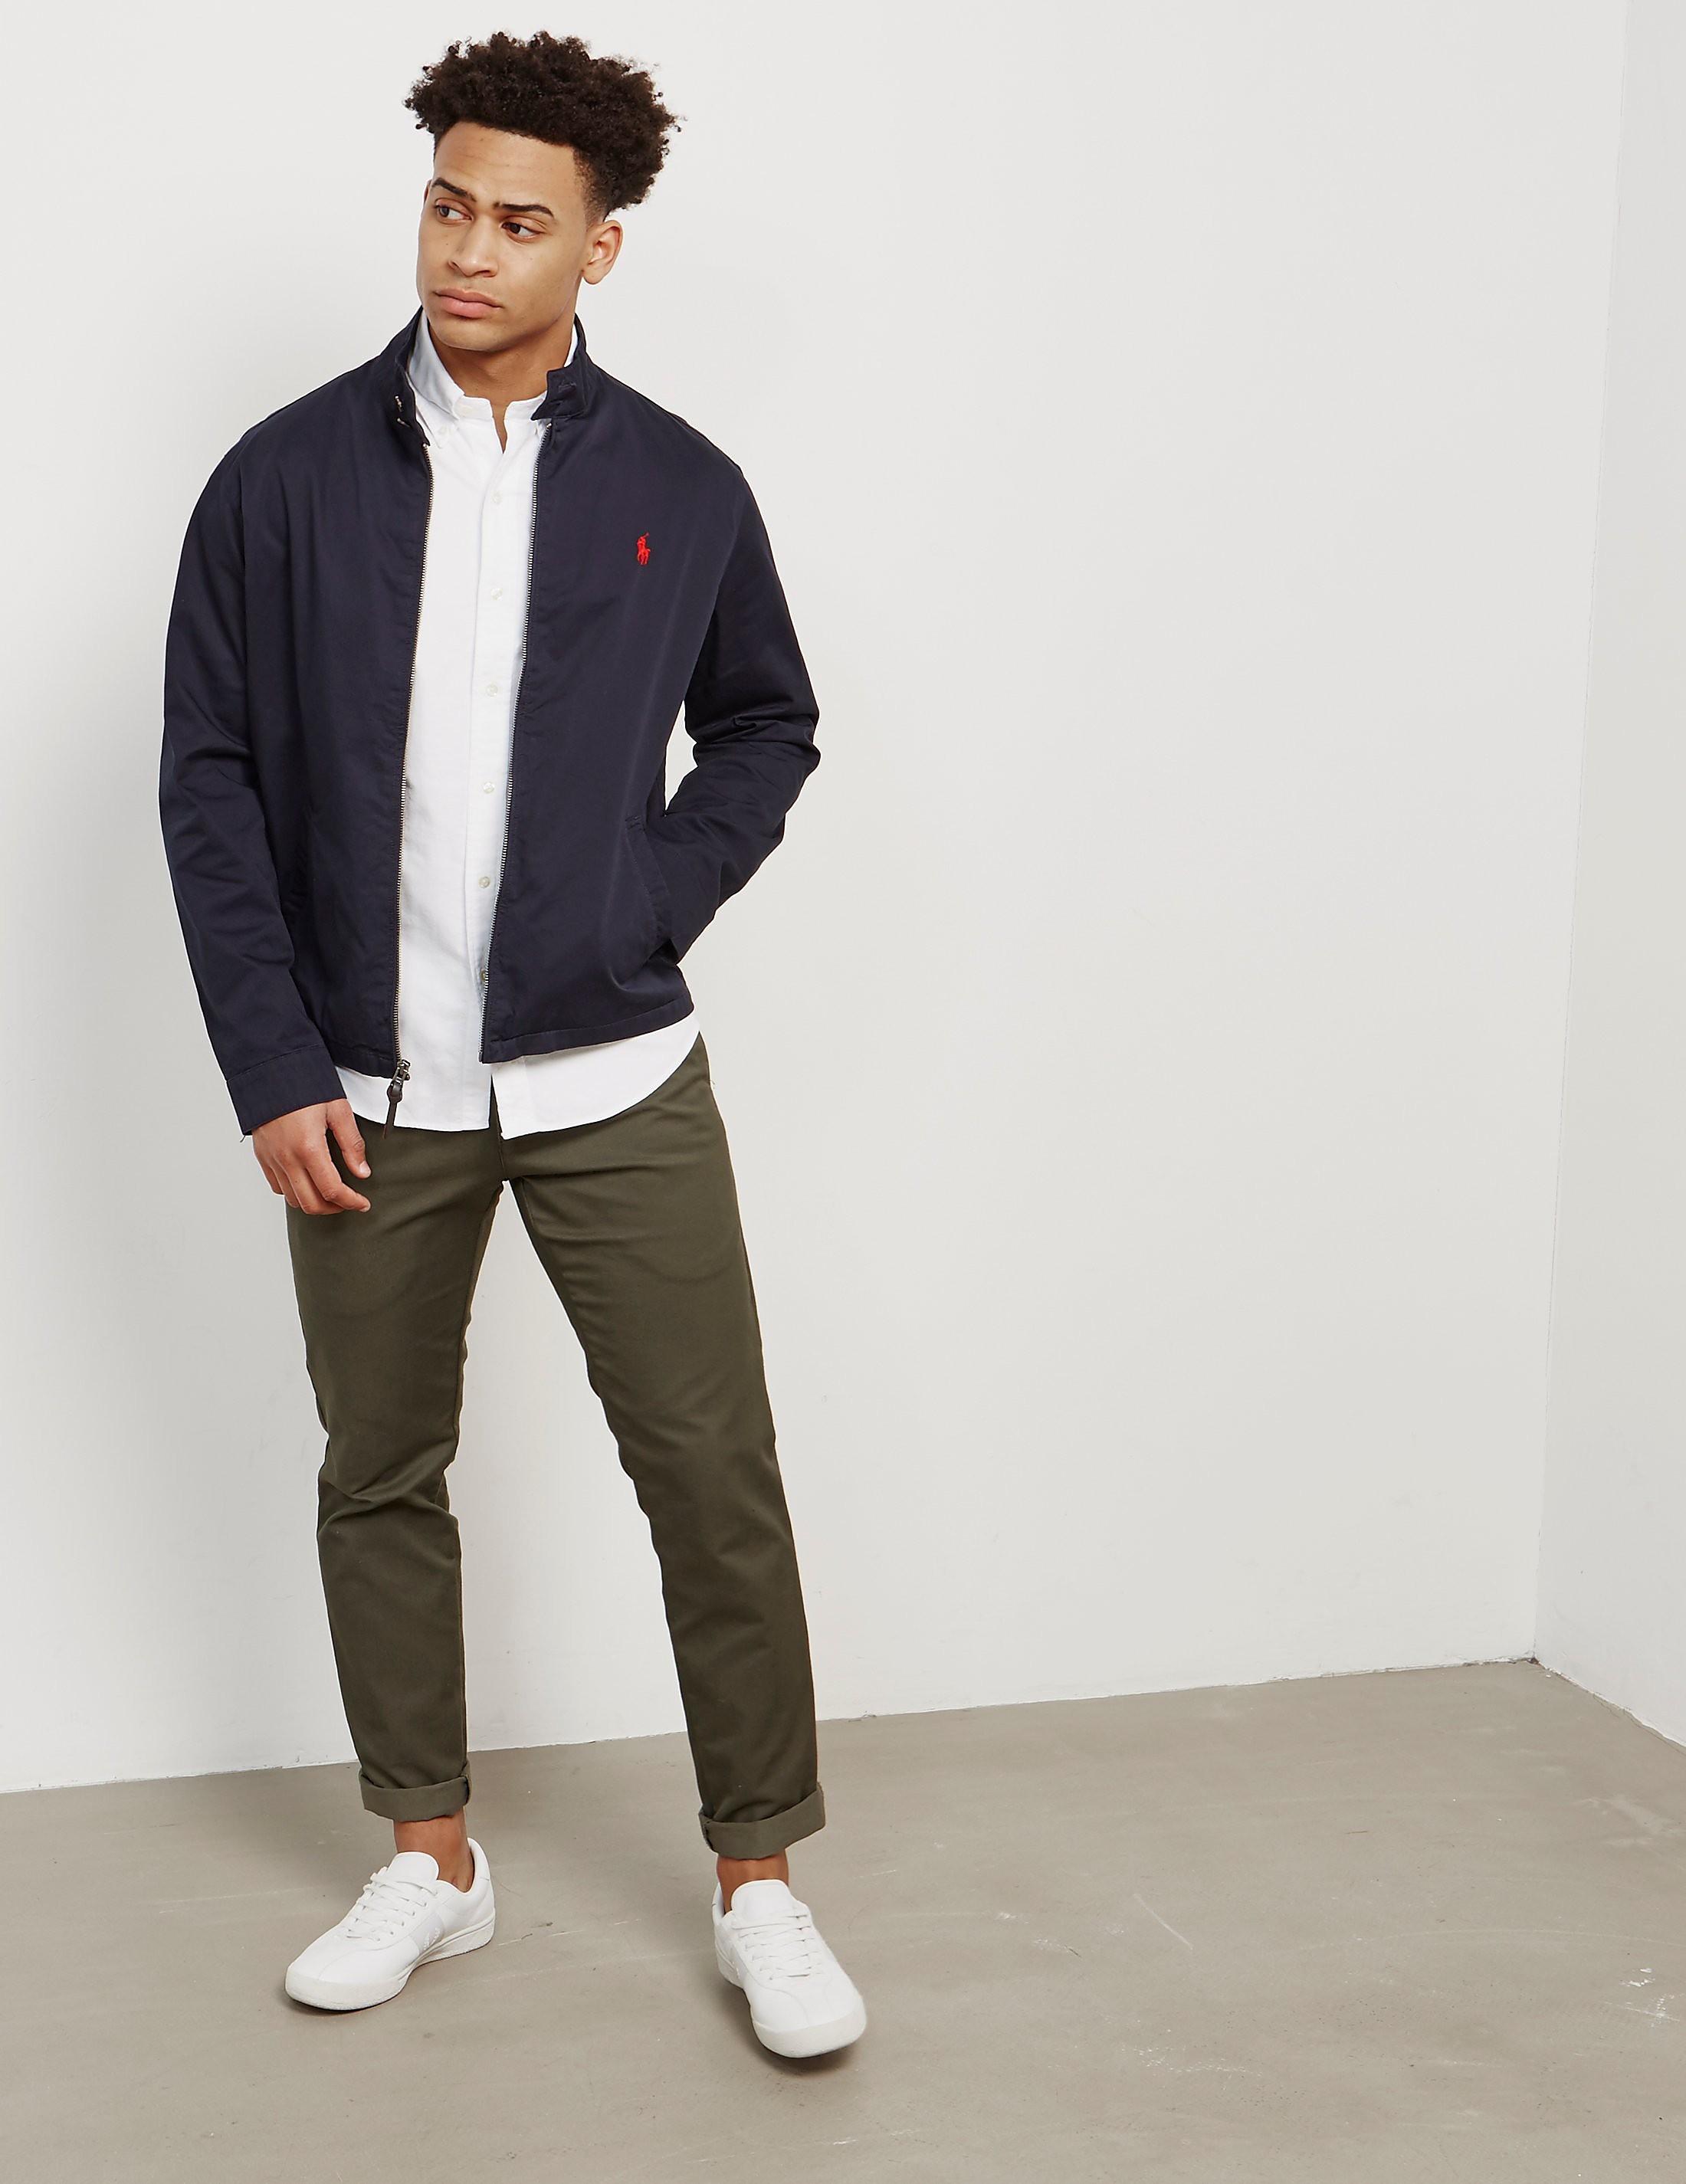 Polo Ralph Lauren Barracuda Jacket